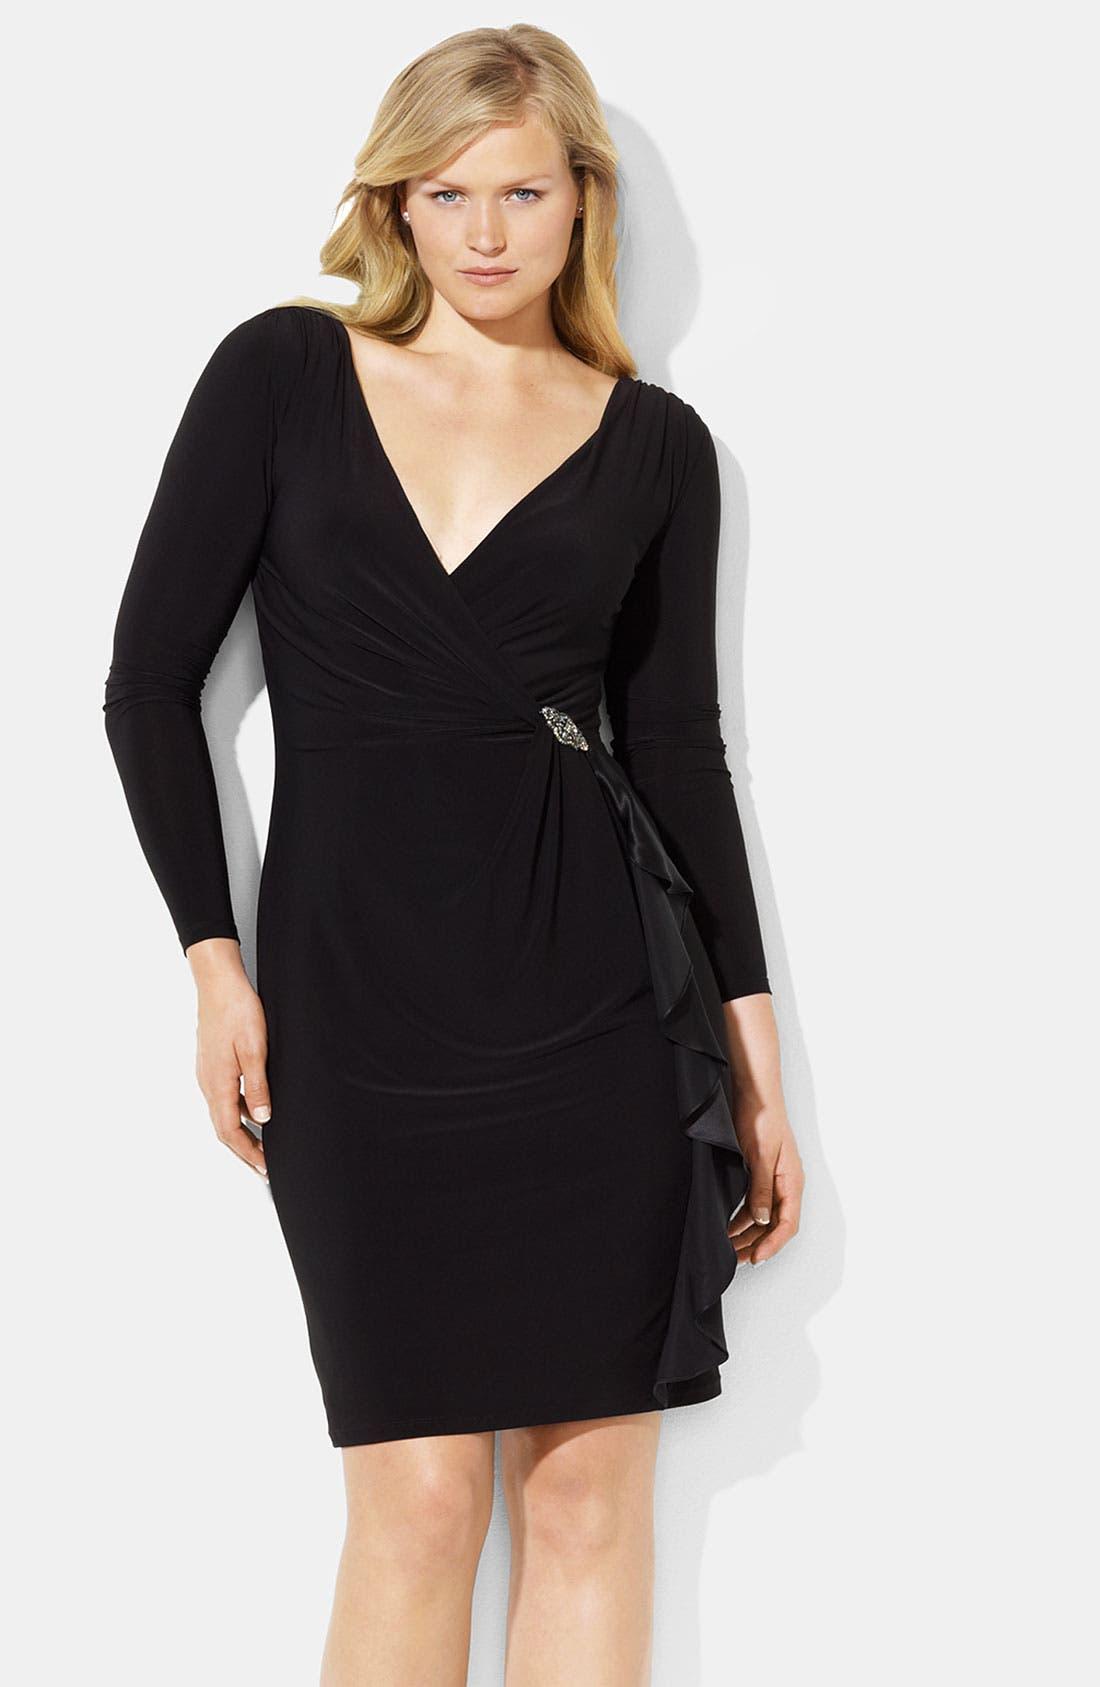 Alternate Image 1 Selected - Lauren Ralph Lauren Ruffle Matte Jersey Sheath Dress (Plus)